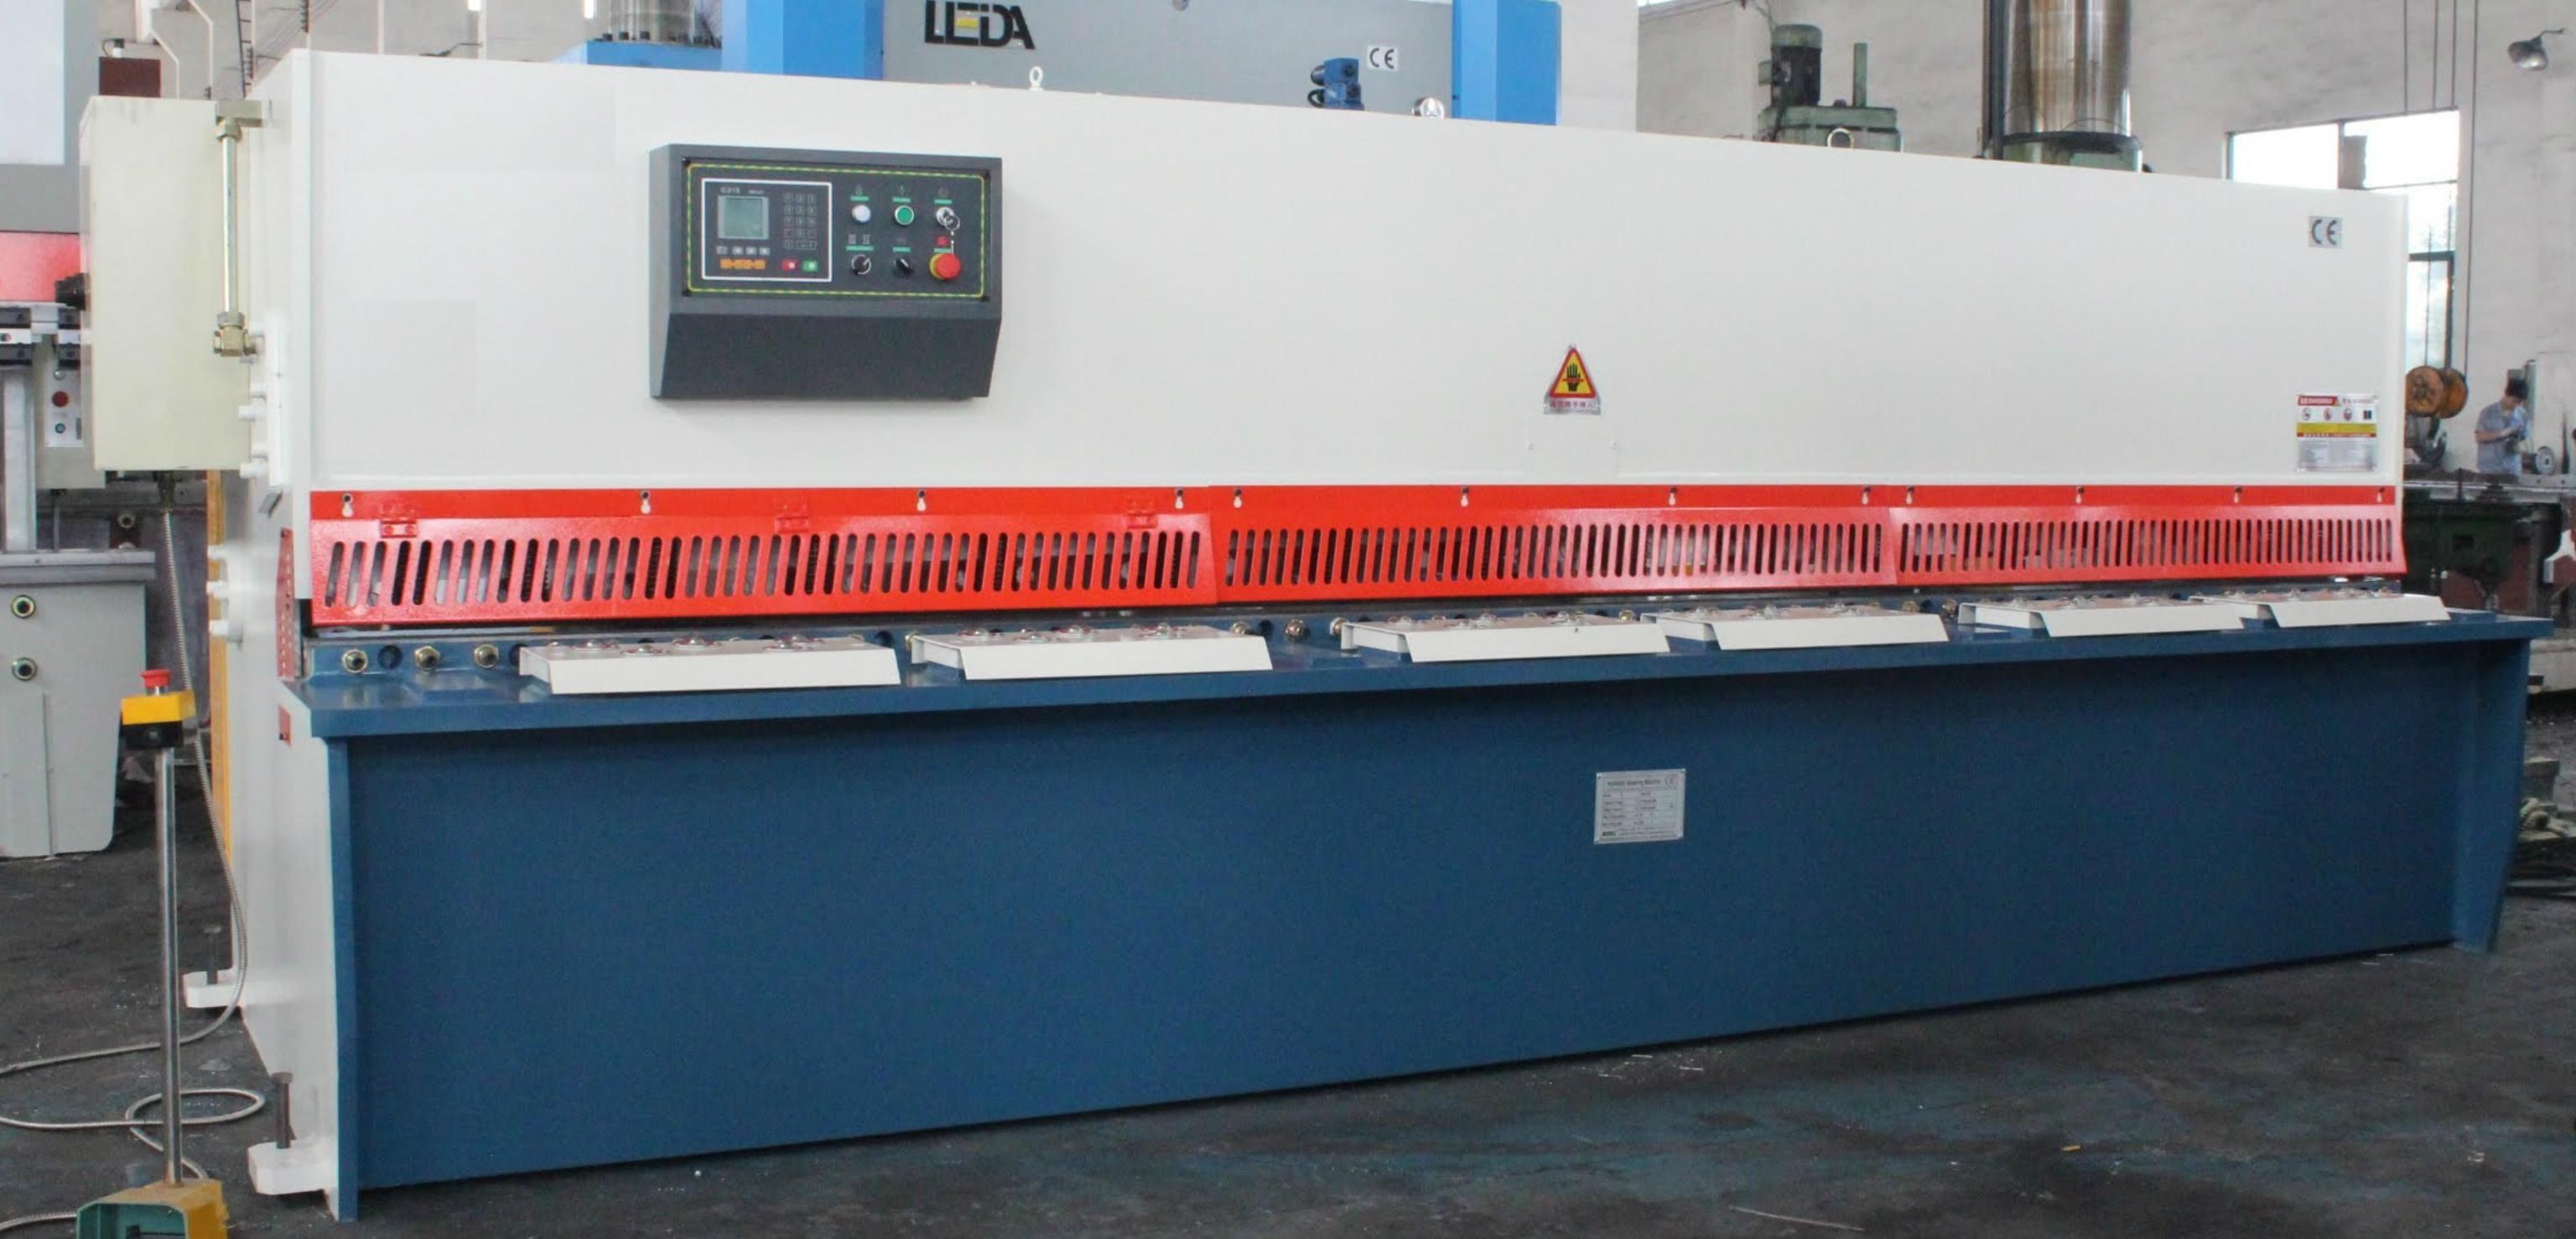 Hydraulic Guillotine Shear supplier from Turkey